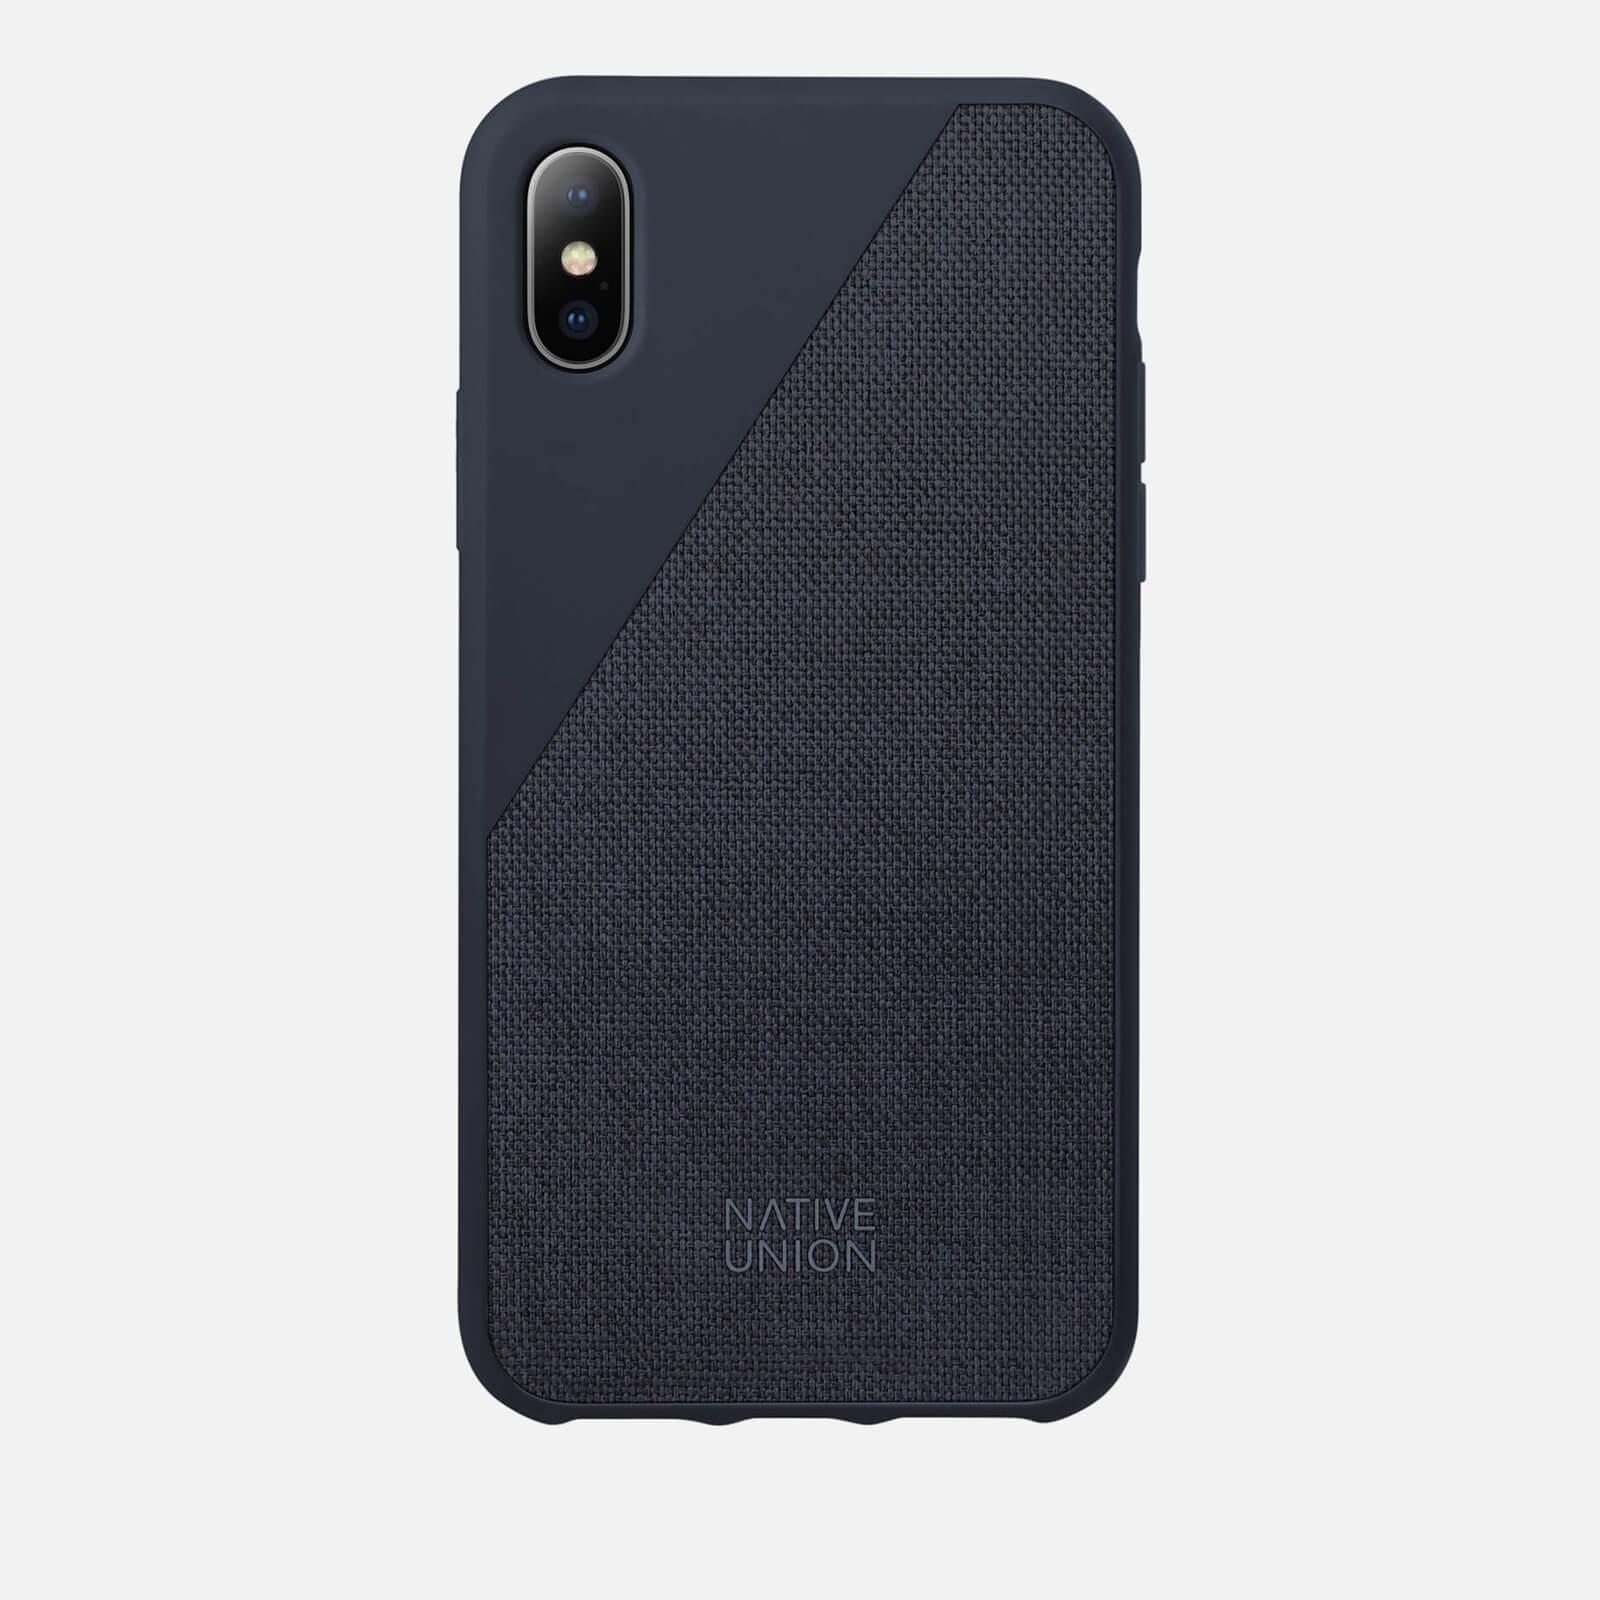 Native Union Clic Canvas - iPhone X Case - Marine